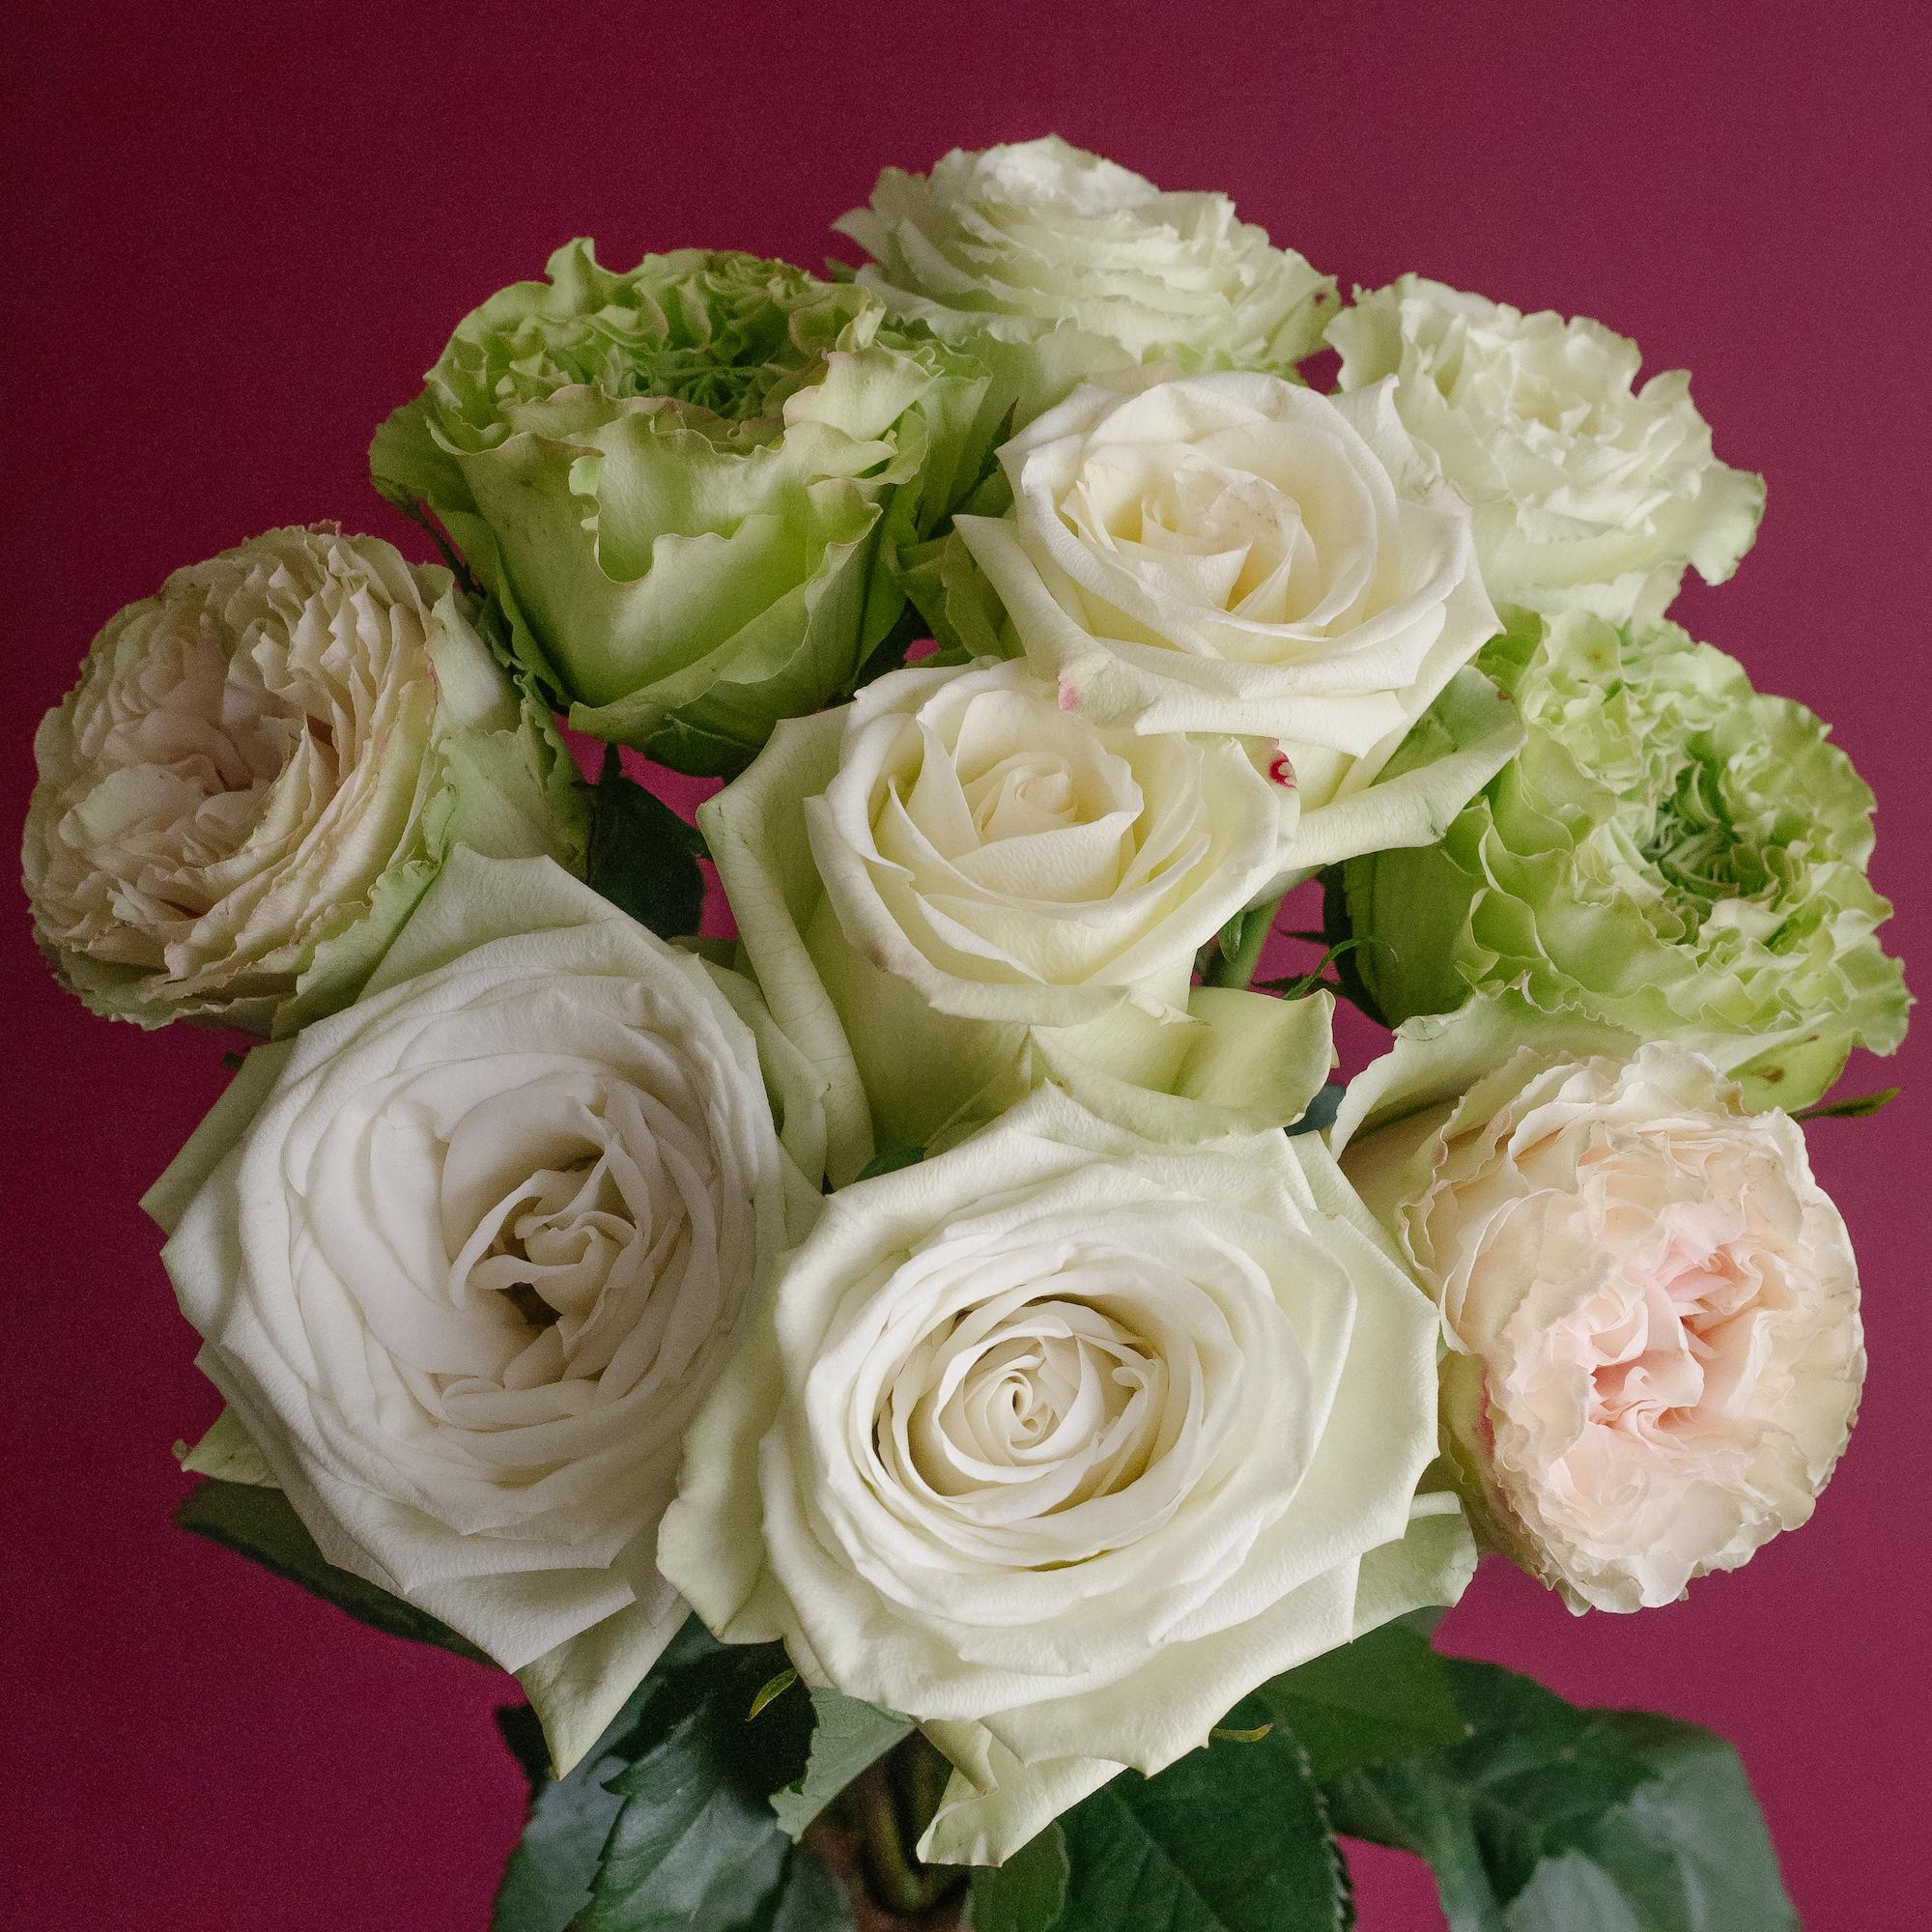 Popular Green Rose Varieties